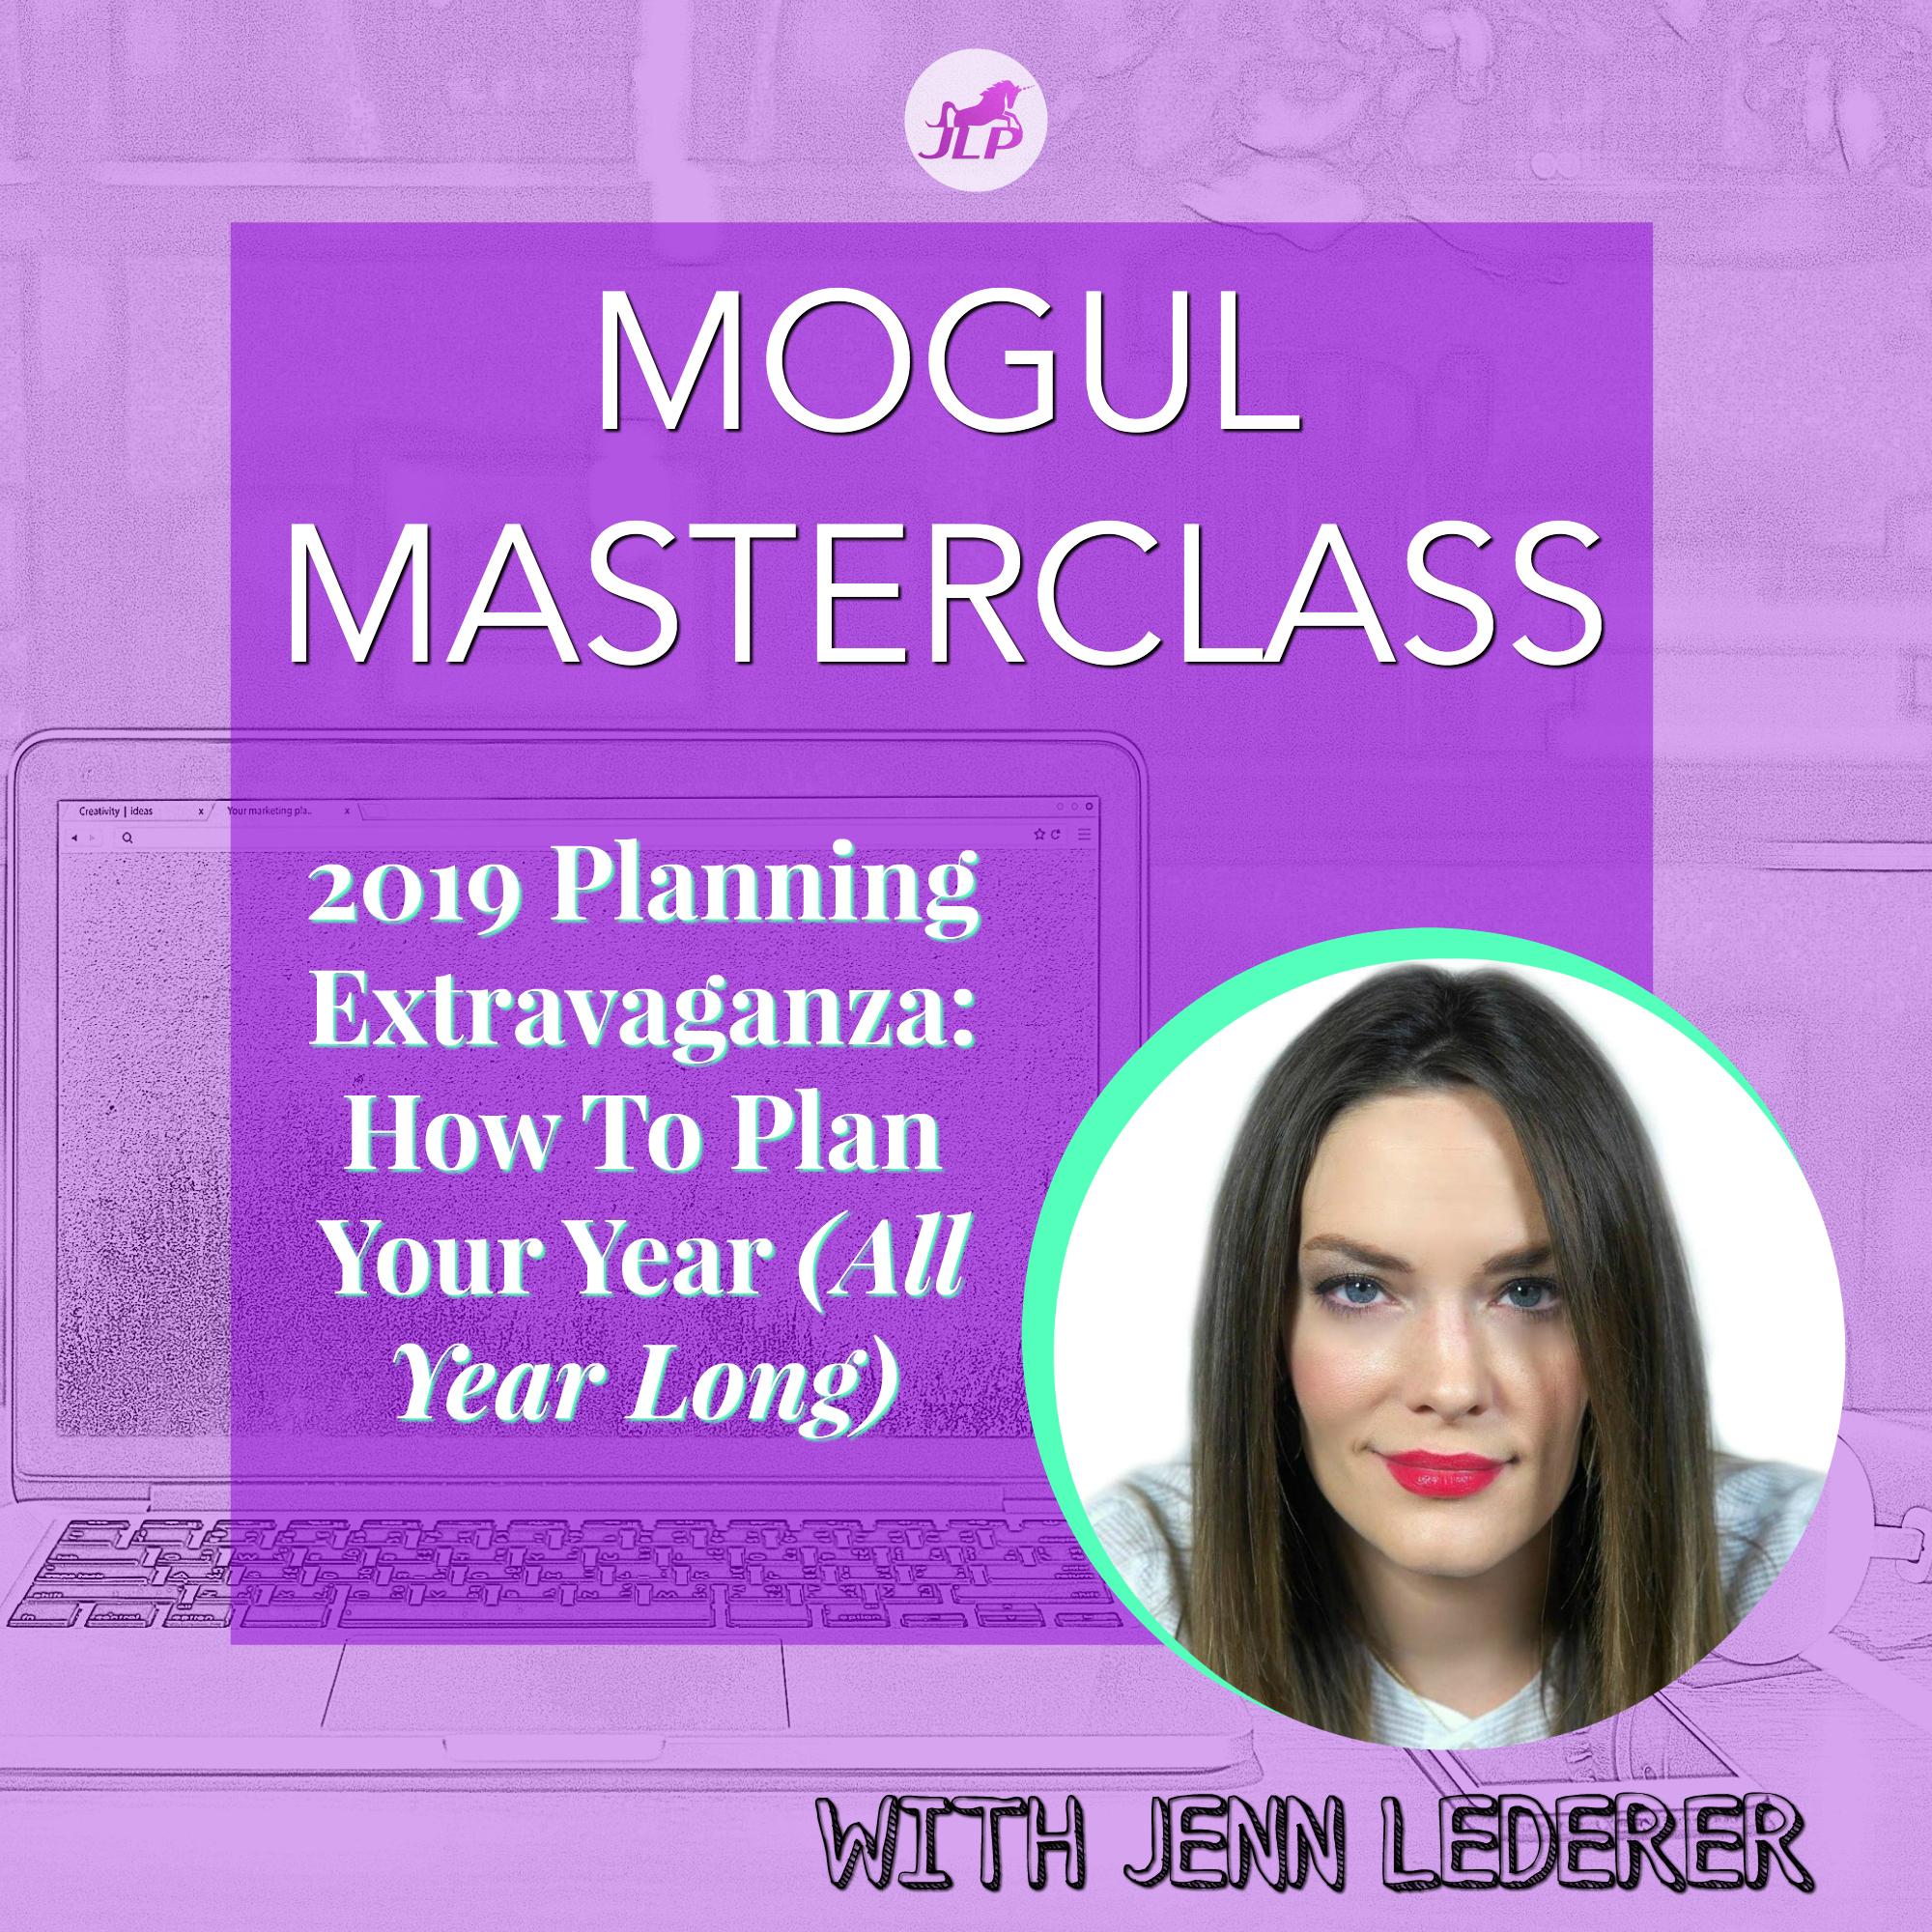 Planning_Mogul_Masterclass_Belinda_Filippelli.jpg